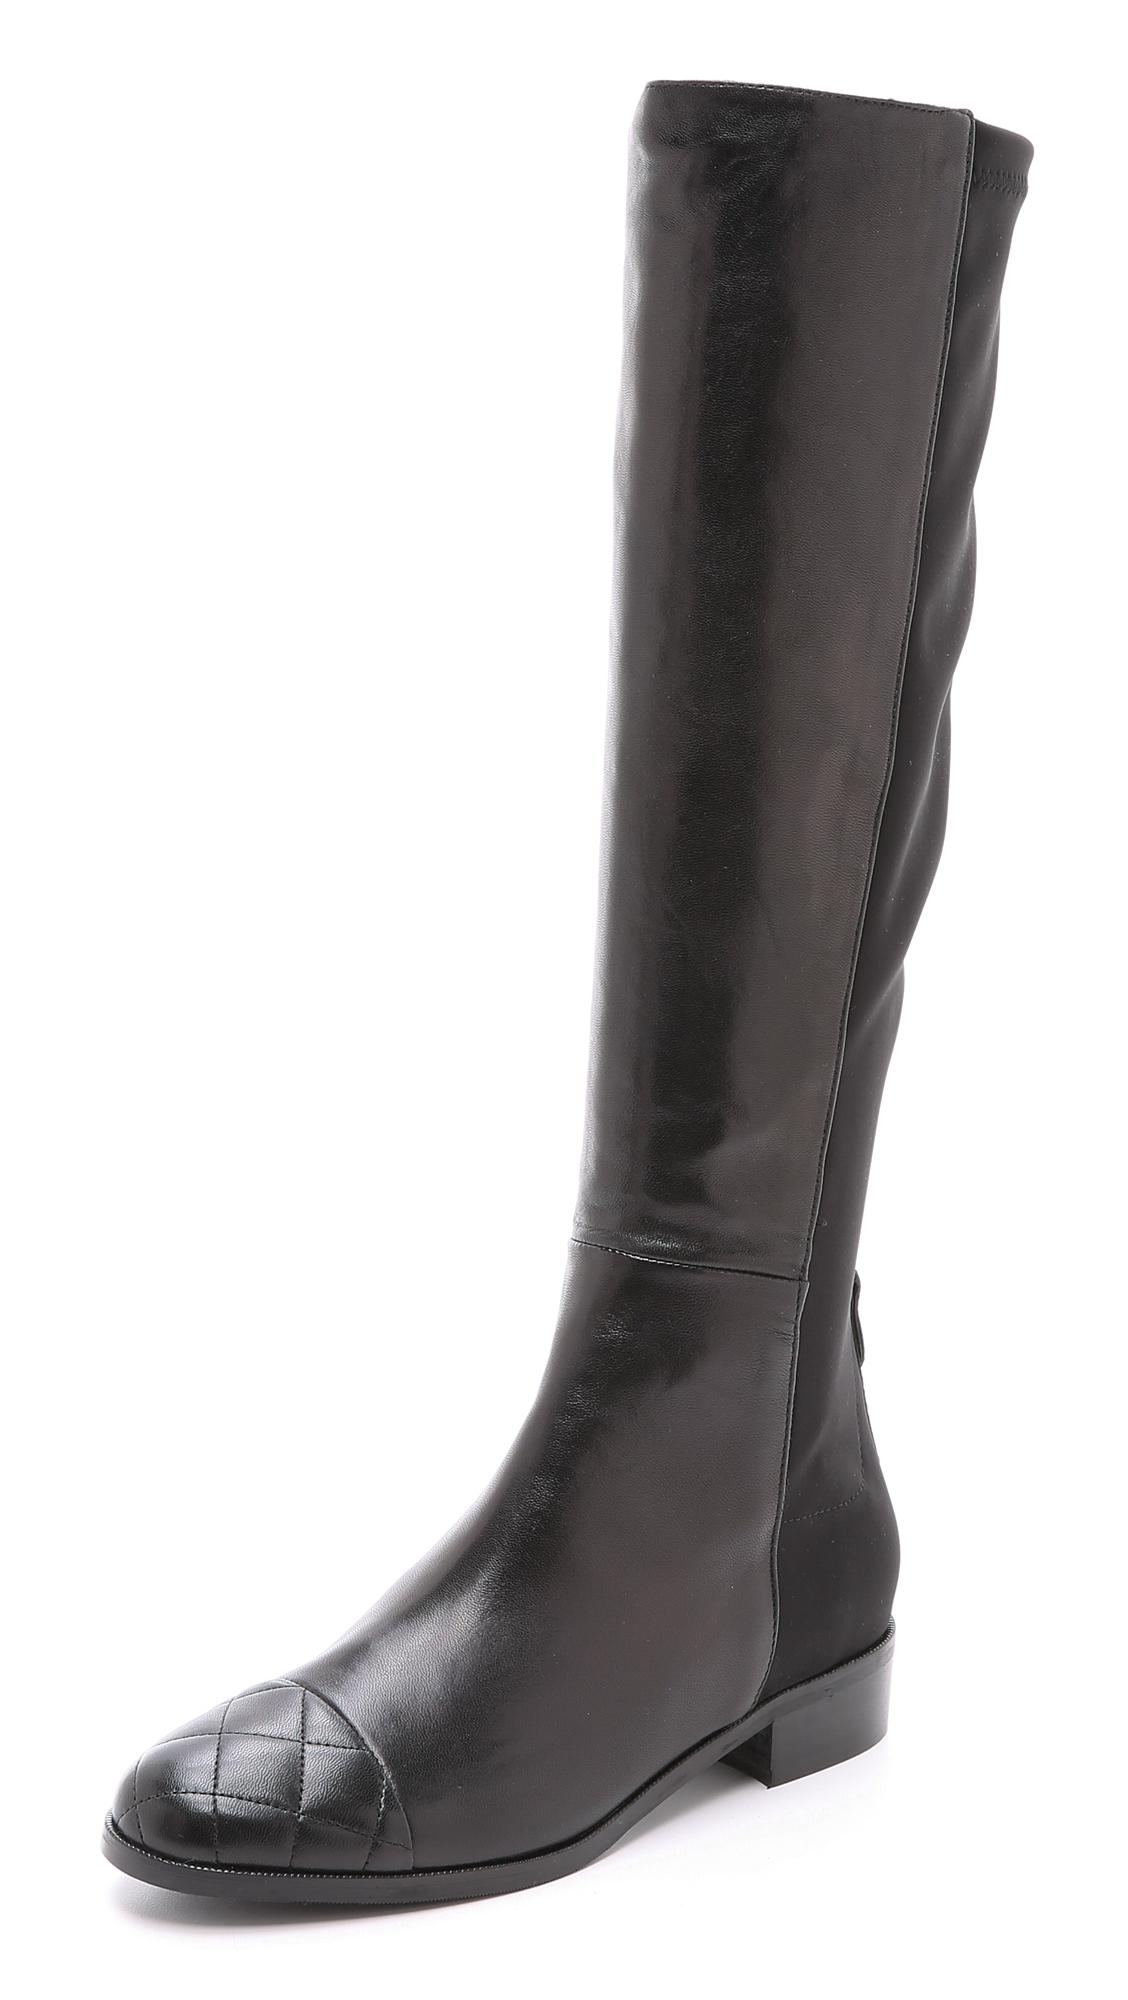 Lk Bennett Sizing Shoes